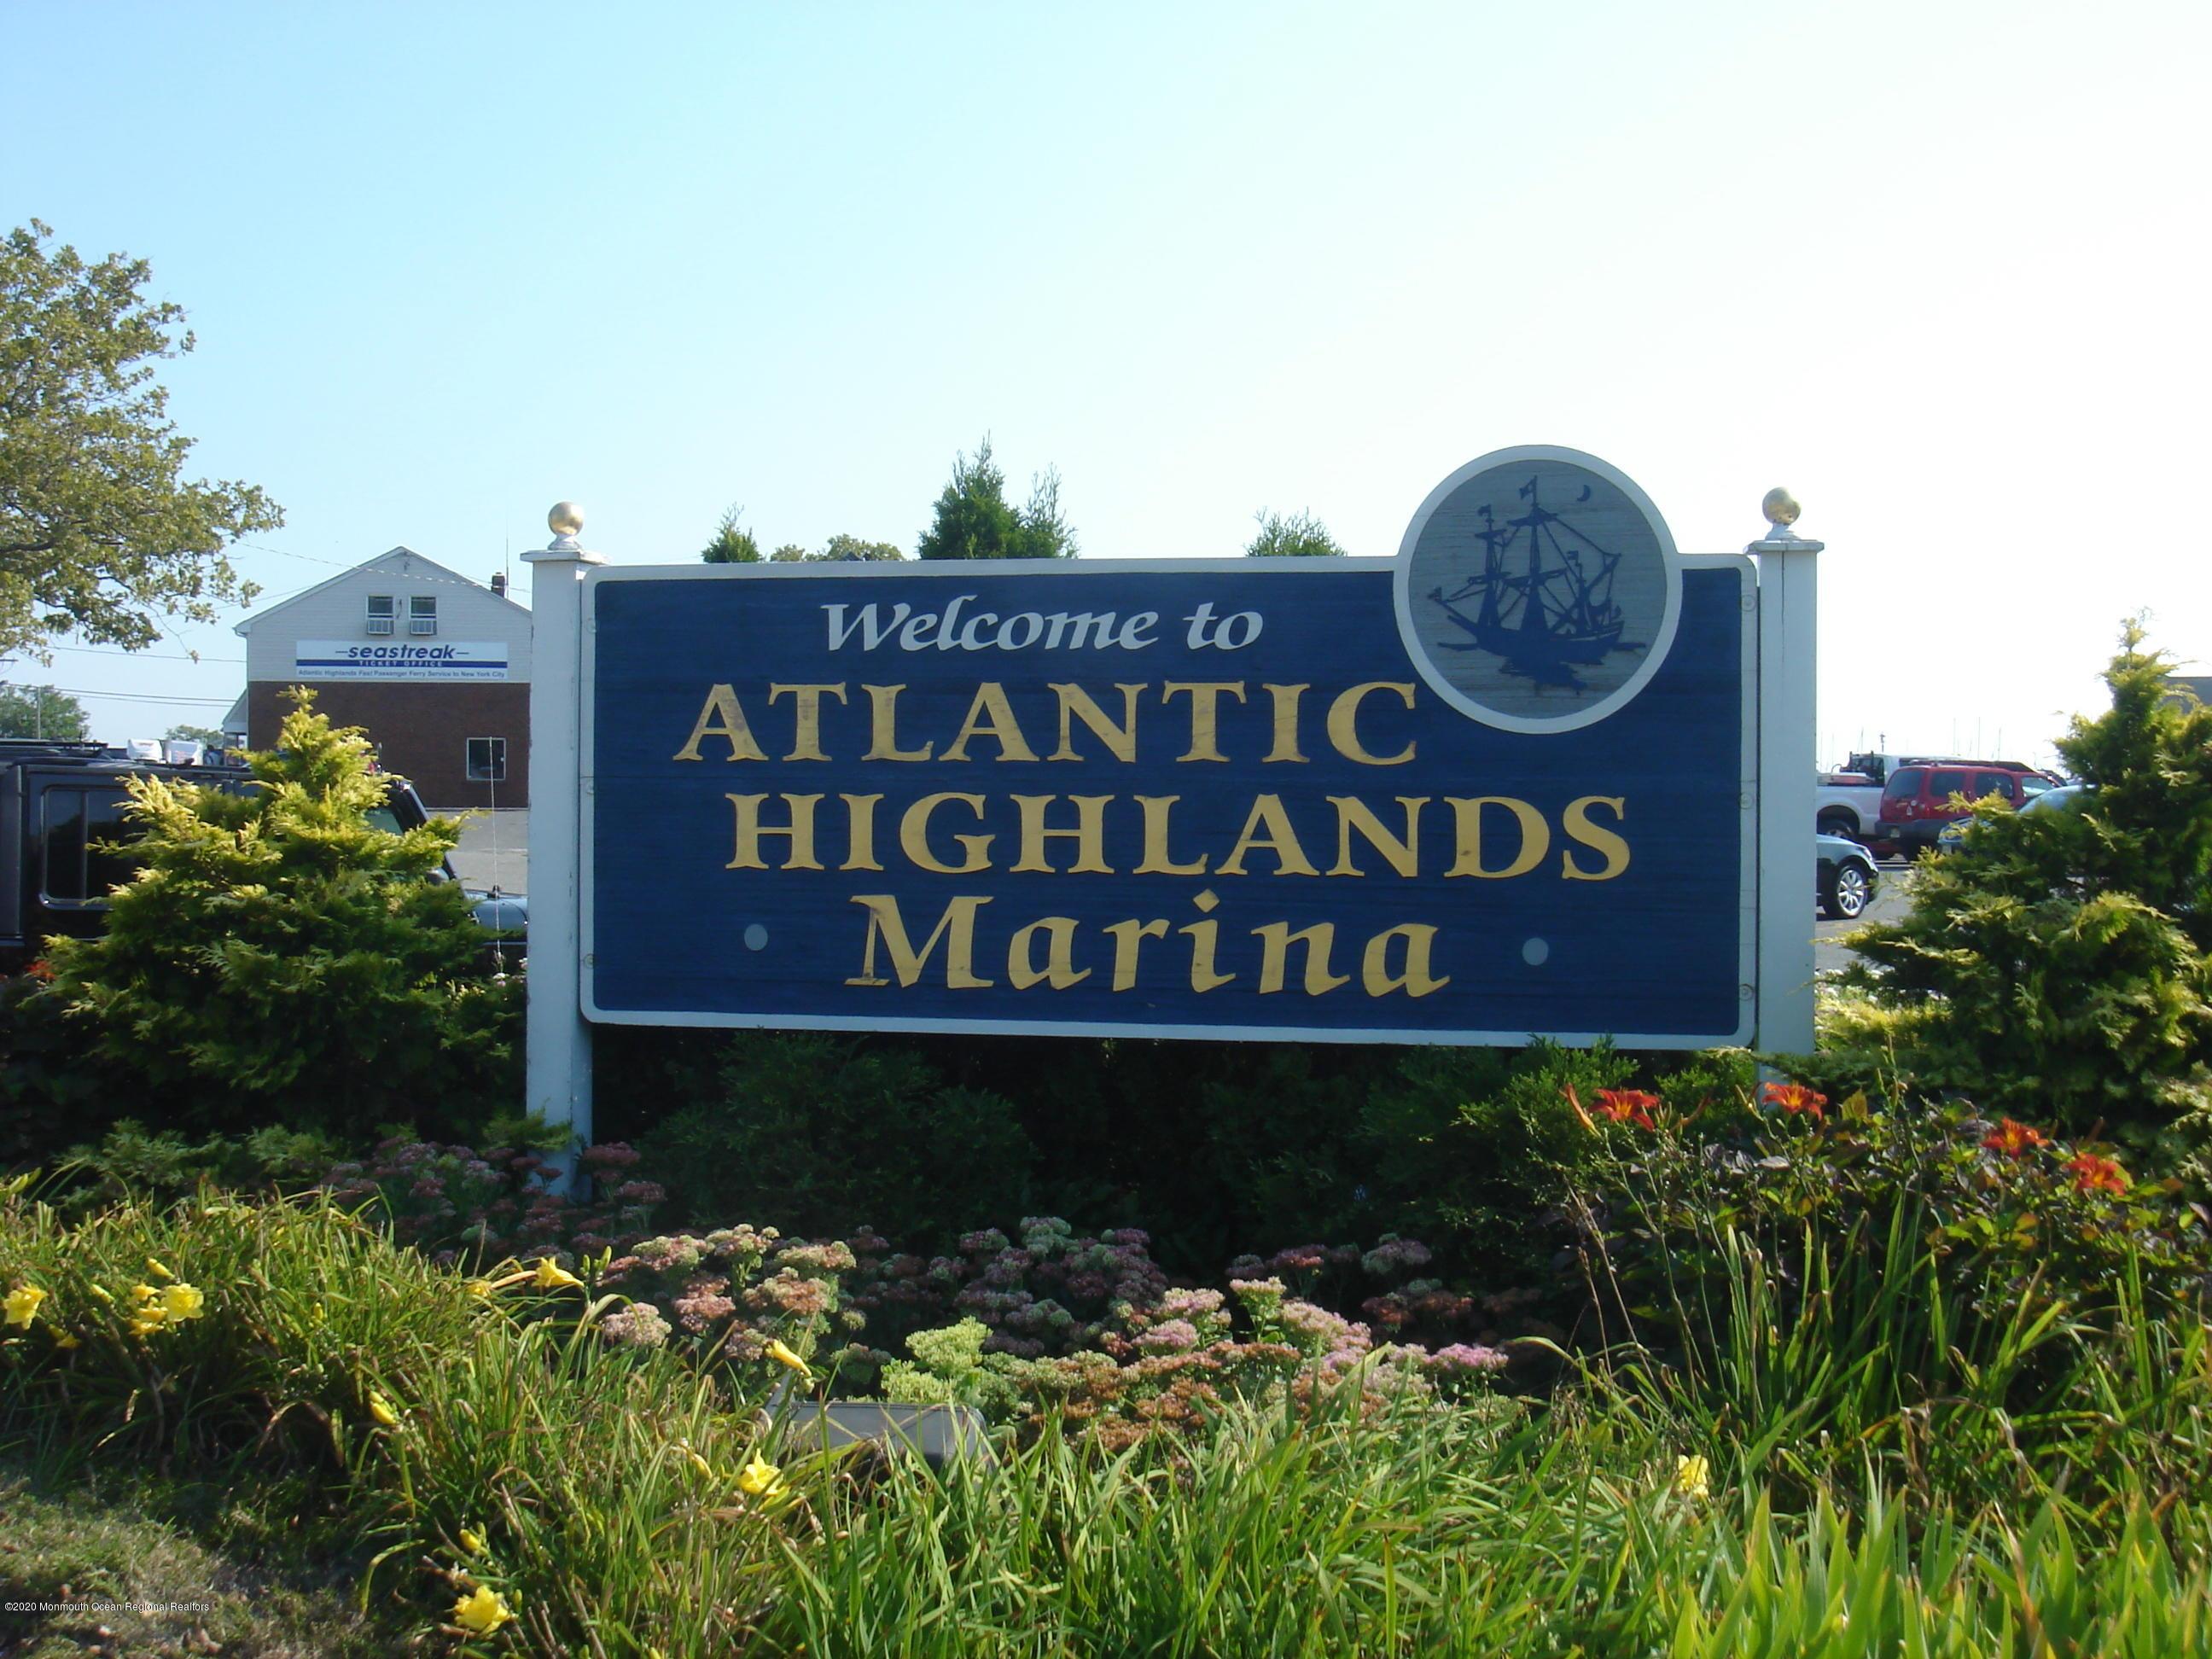 Photo of First Avenue #D, Atlantic Highlands, NJ 07716